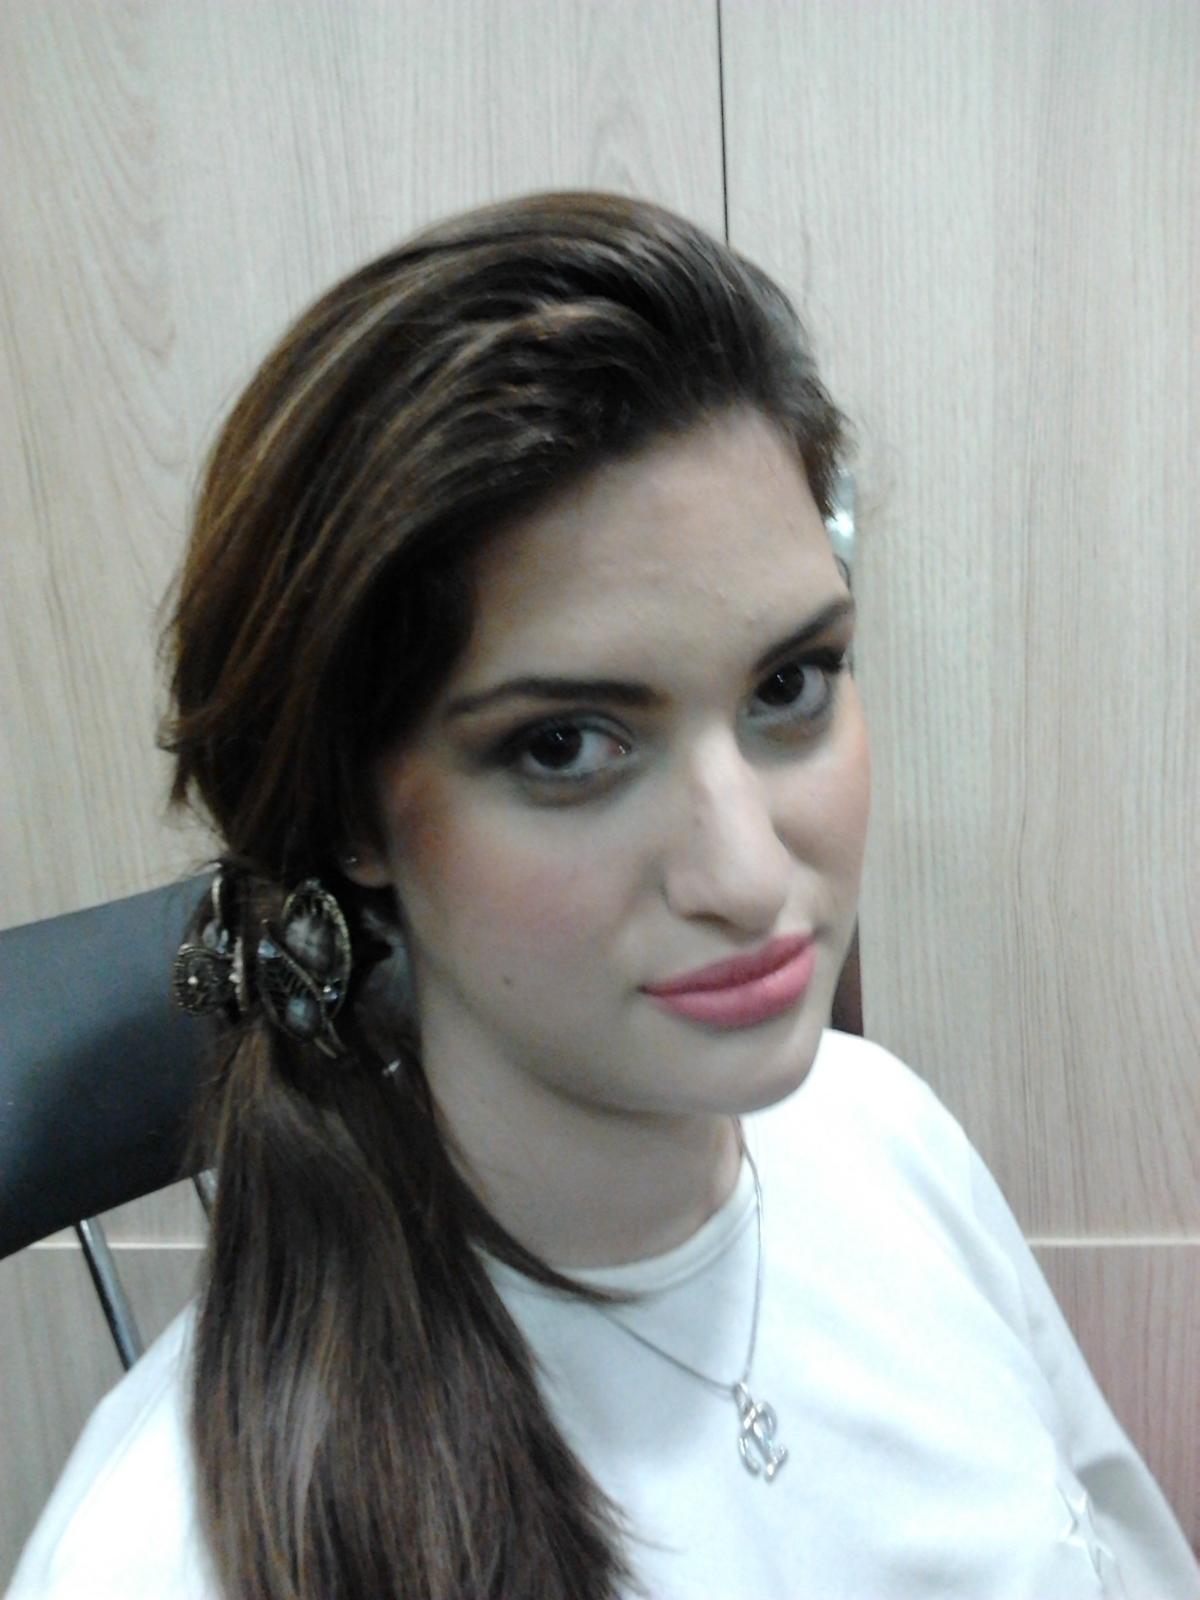 Maquiagem10 maquiador(a) consultor(a) de estetica